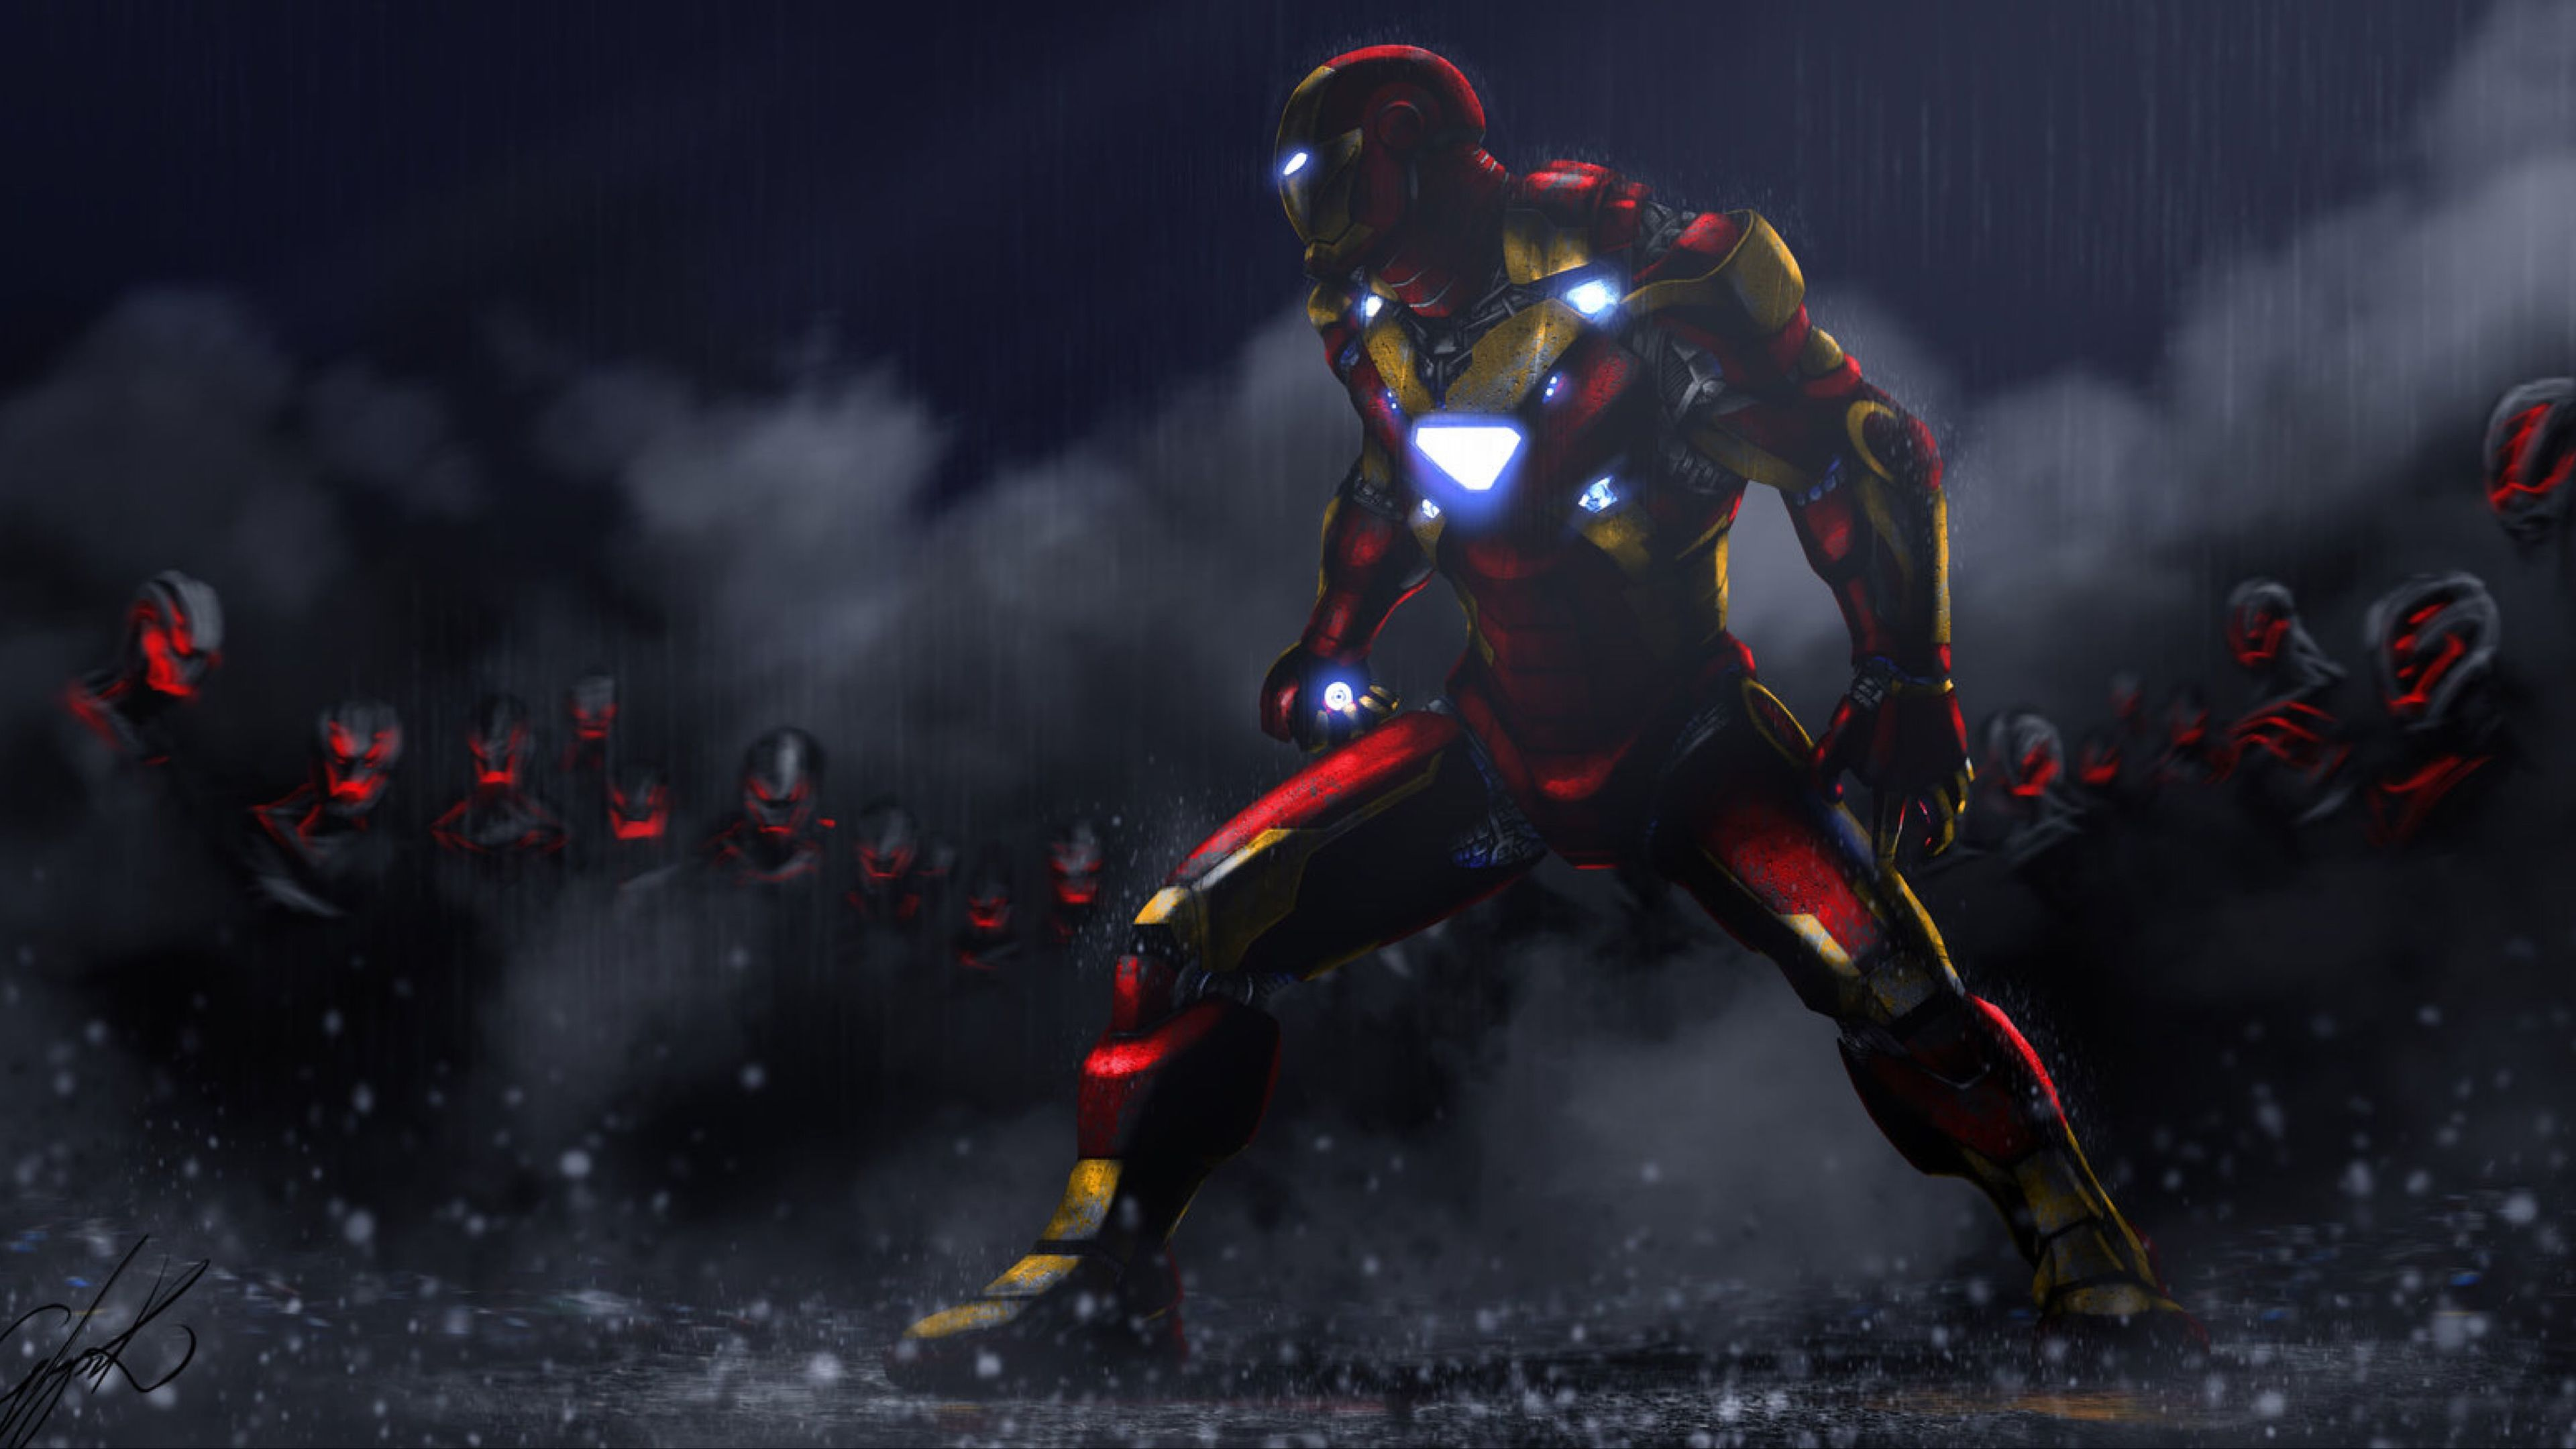 5k iron man 2018 1538786560 - 5k Iron Man 2018 - superheroes wallpapers, iron man wallpapers, hd-wallpapers, digital art wallpapers, artwork wallpapers, art wallpapers, 5k wallpapers, 4k-wallpapers